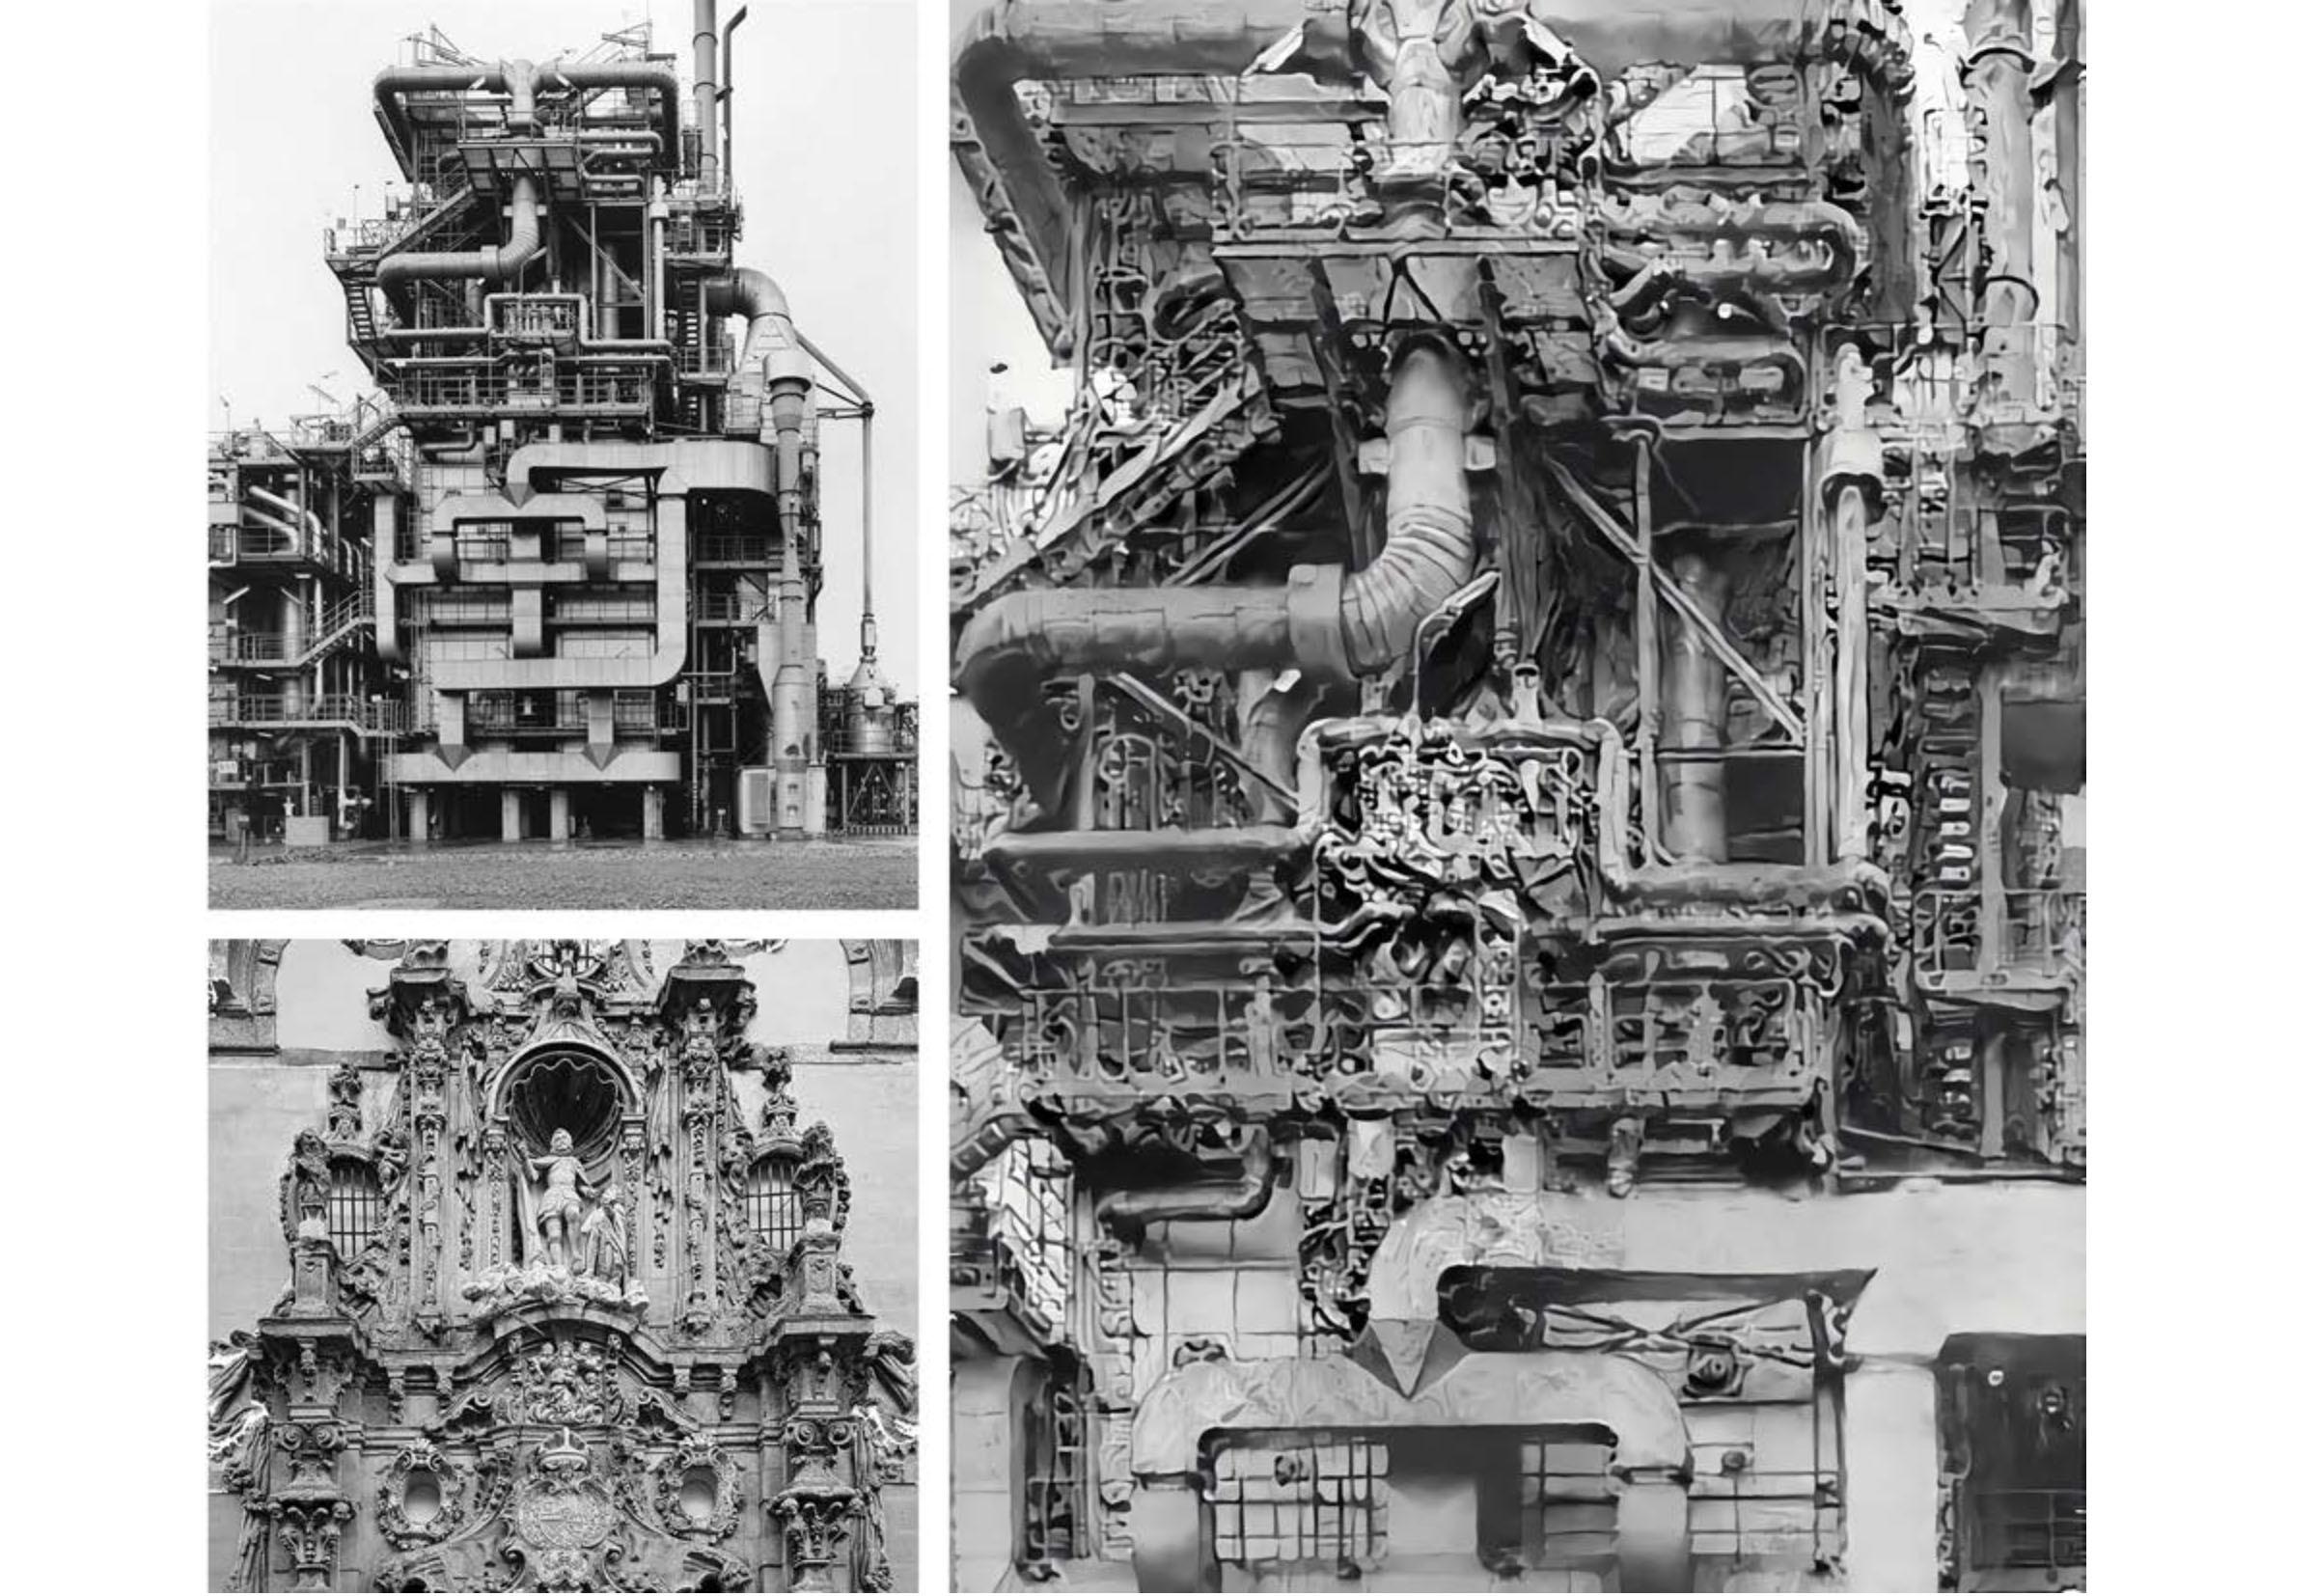 David Ruy vertical studio lottery machine vision collage